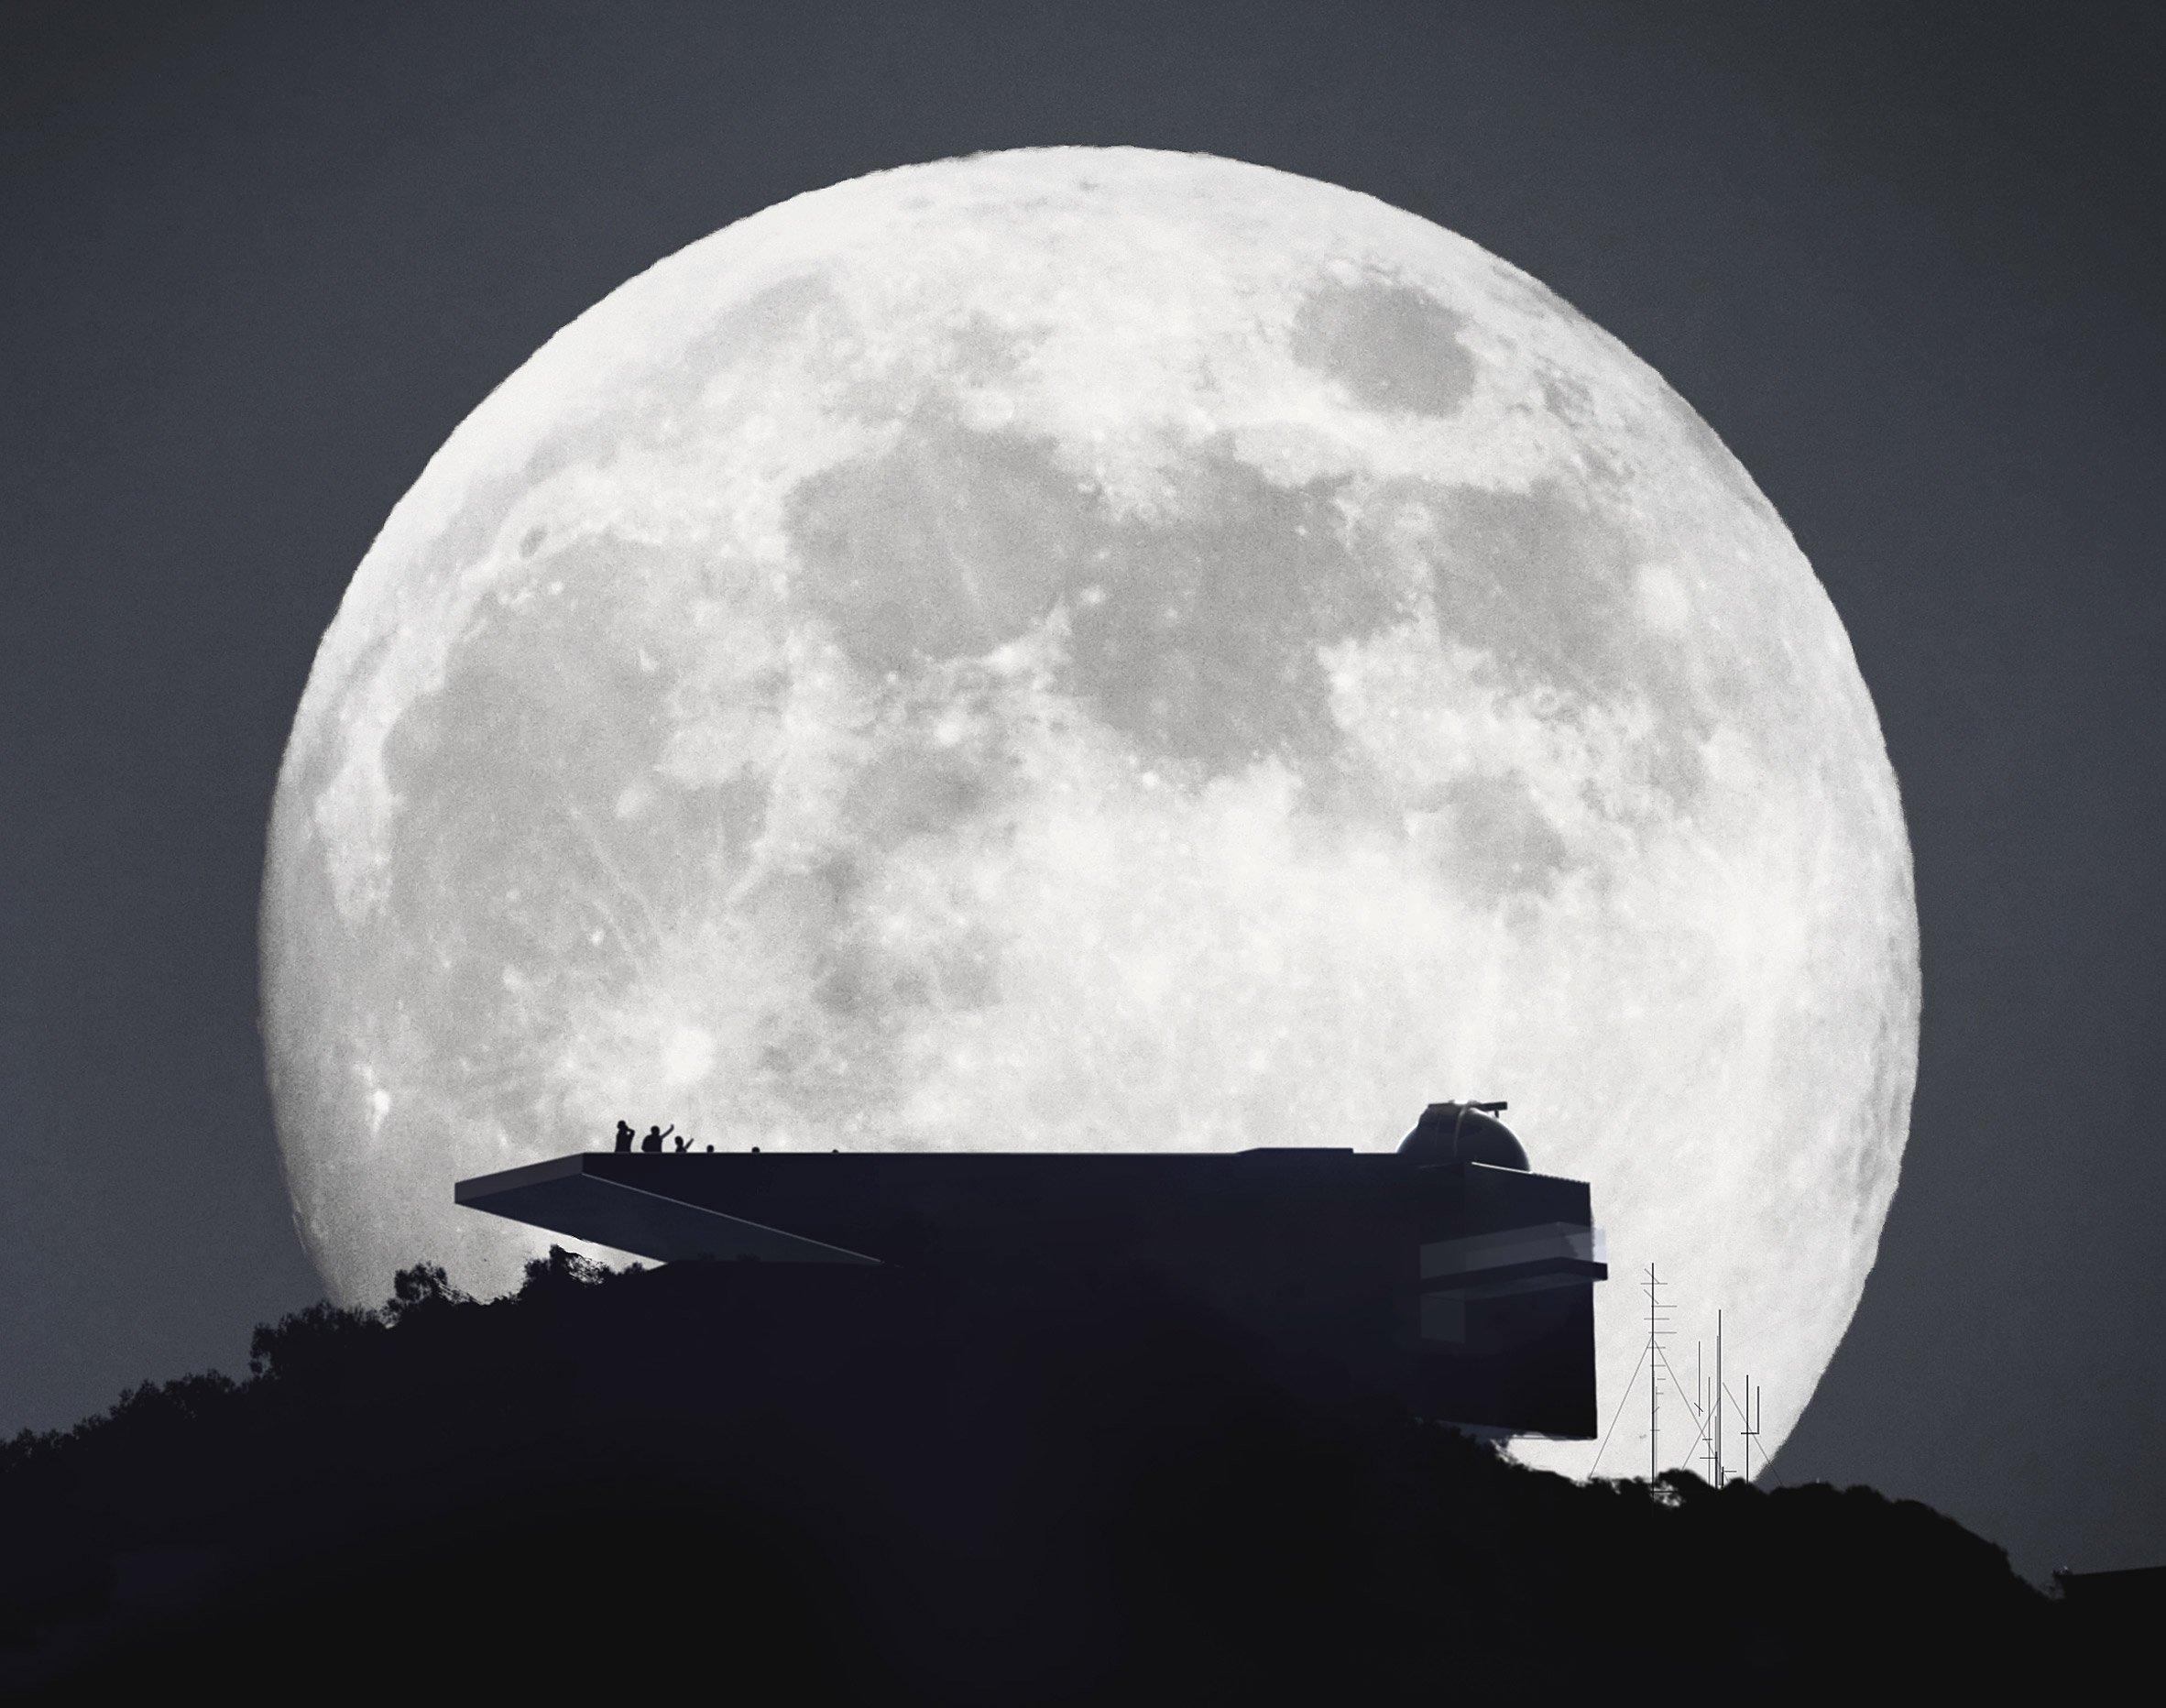 star observatory kyriakos tsolakis architecture news dezeen 2364 col 3 - An observatory inspire in Star Wars films